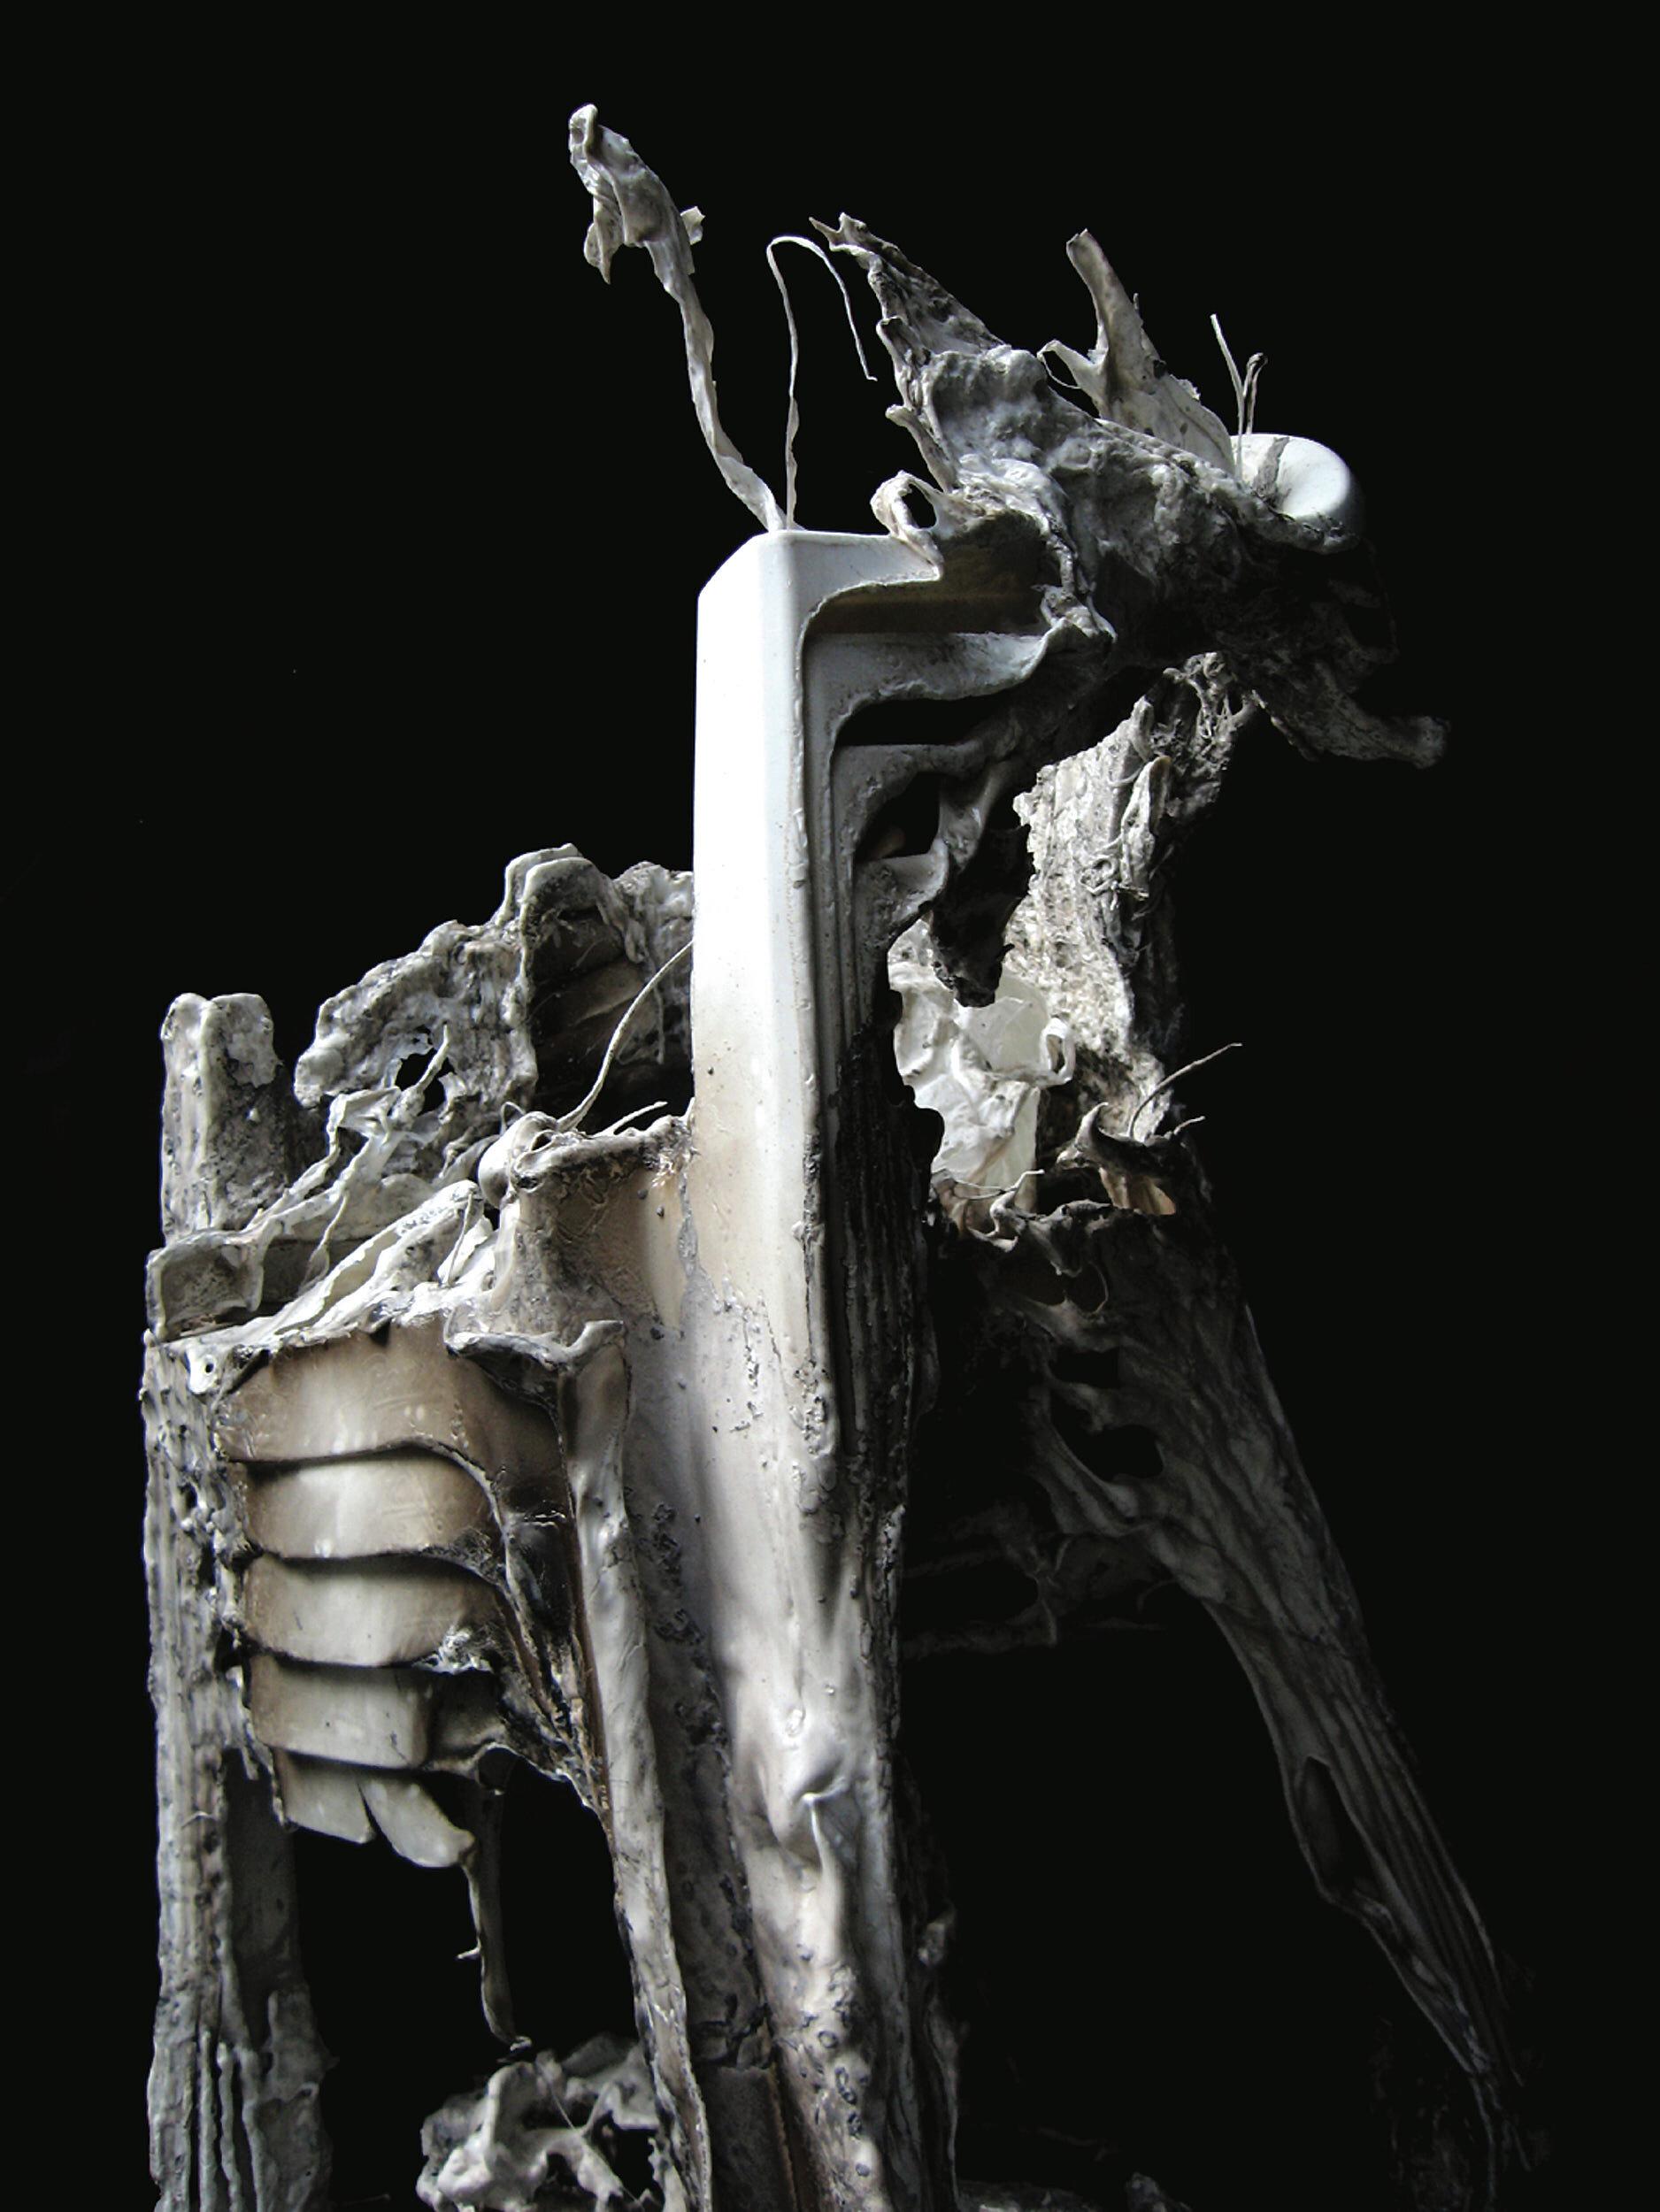 Burnout — Courtesy Krupic Kersting Gallery, Cologne